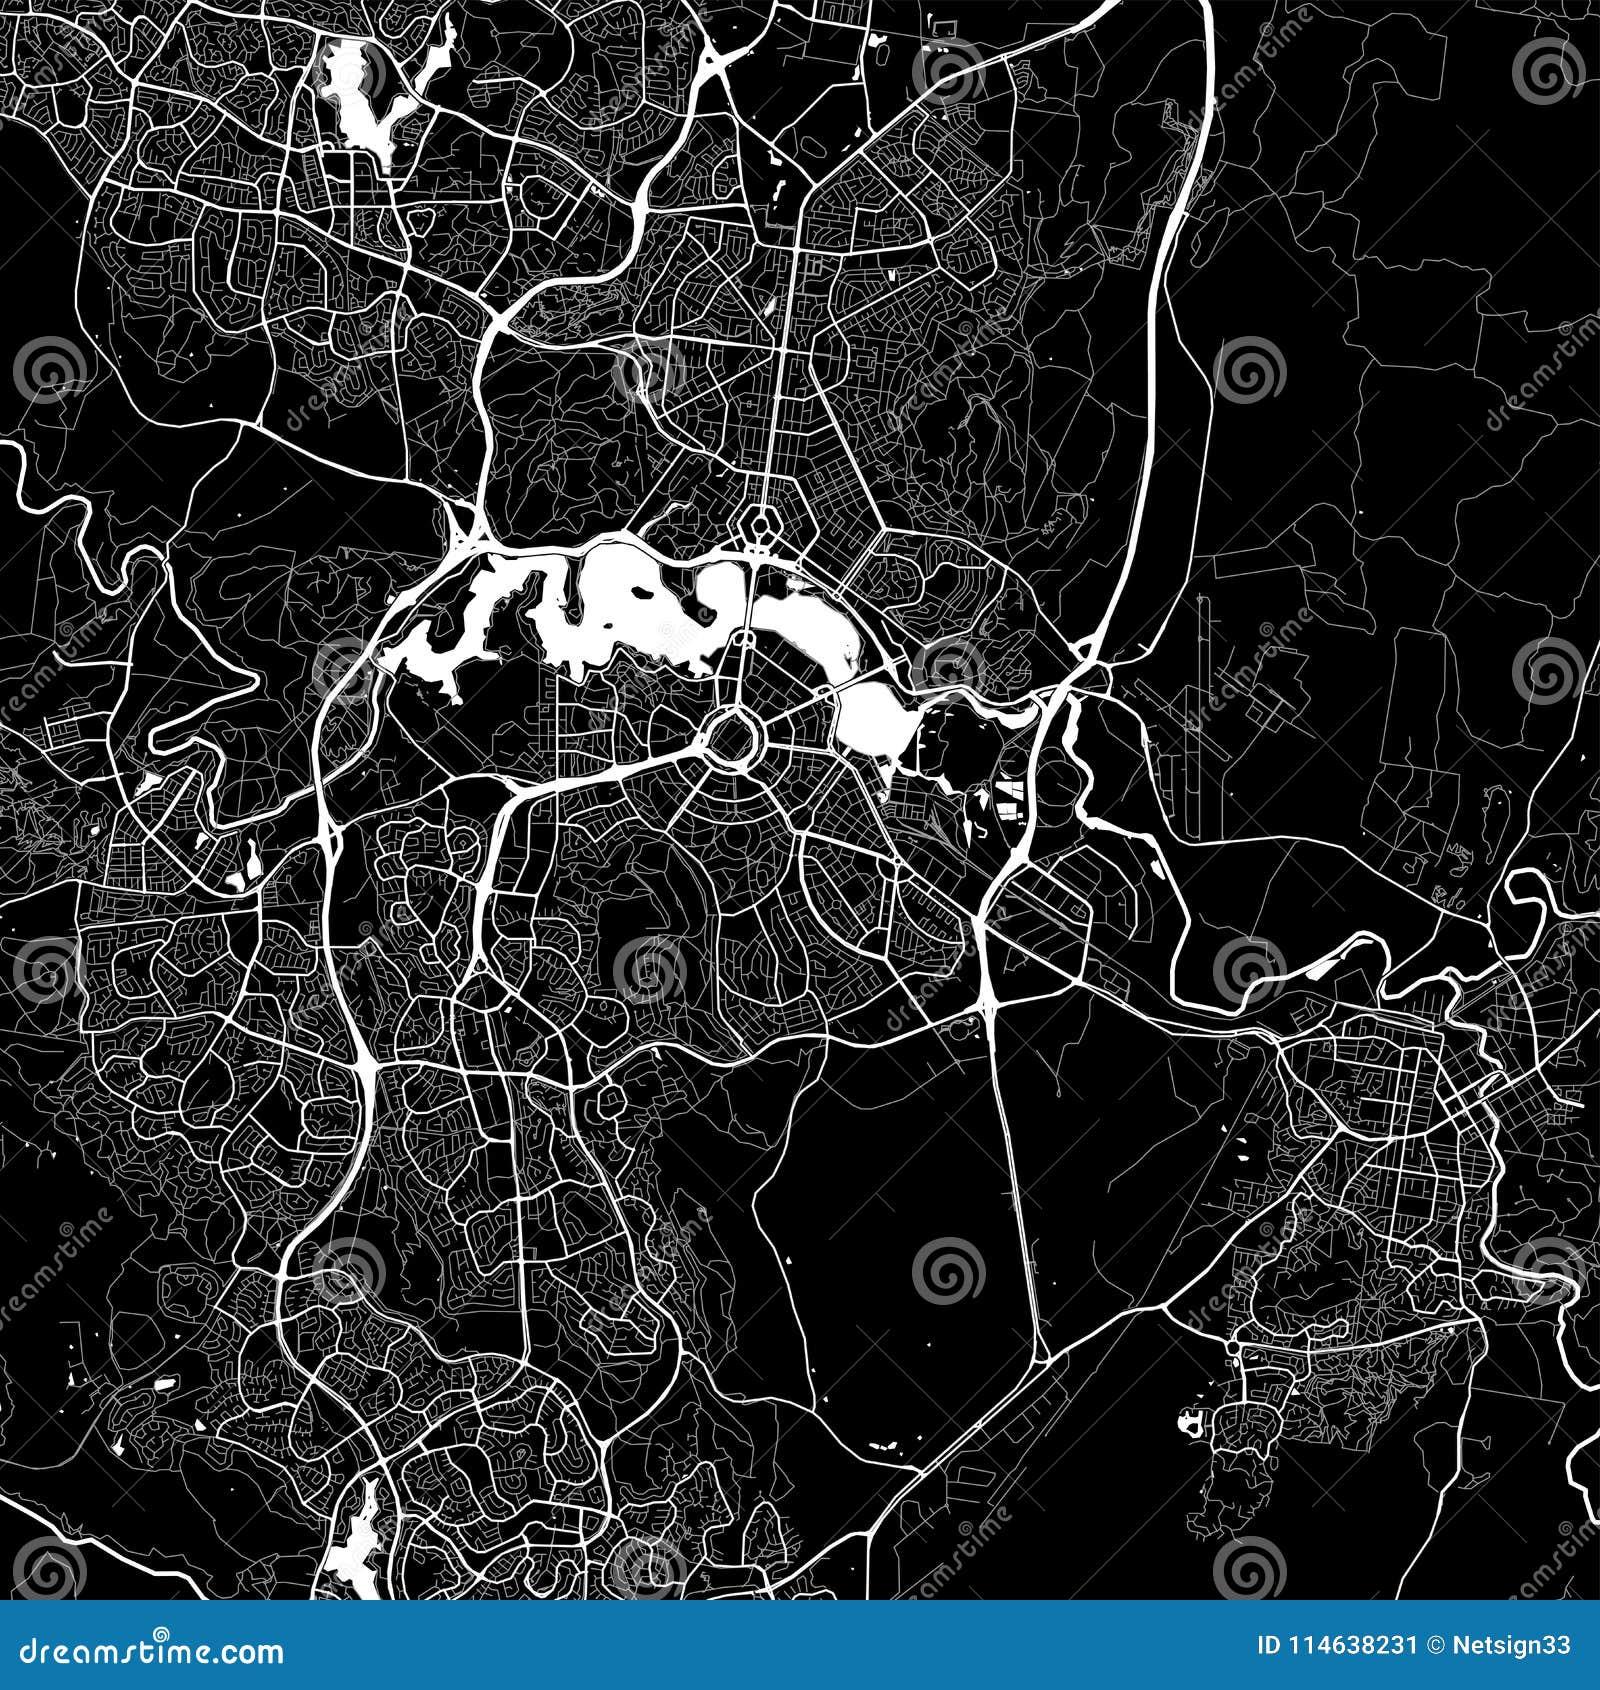 Area map of Canberra, Australia